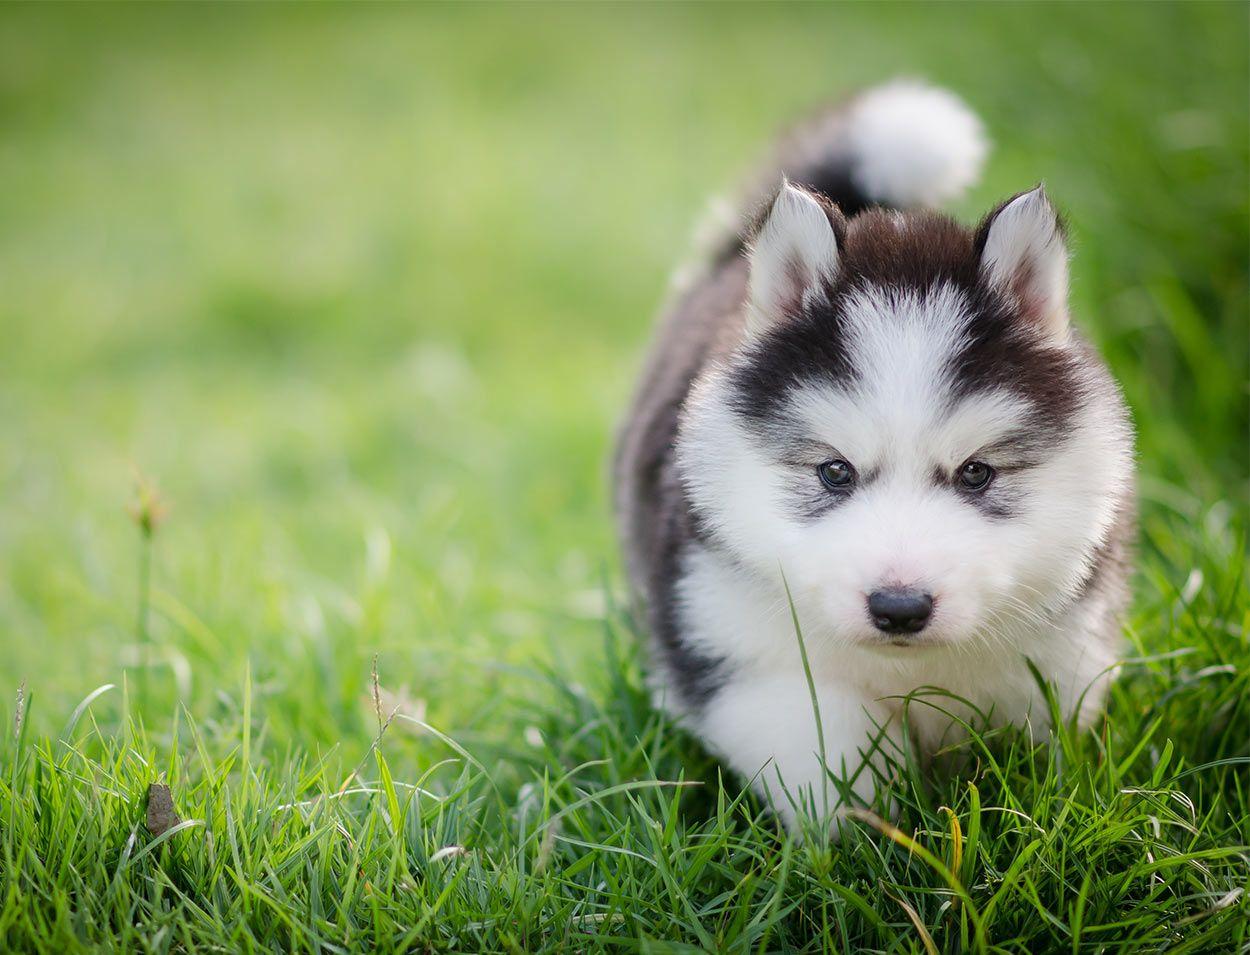 Lovely Doghttps I Redd It Er9x7as369421 Jpg Husky Puppy Puppies Husky